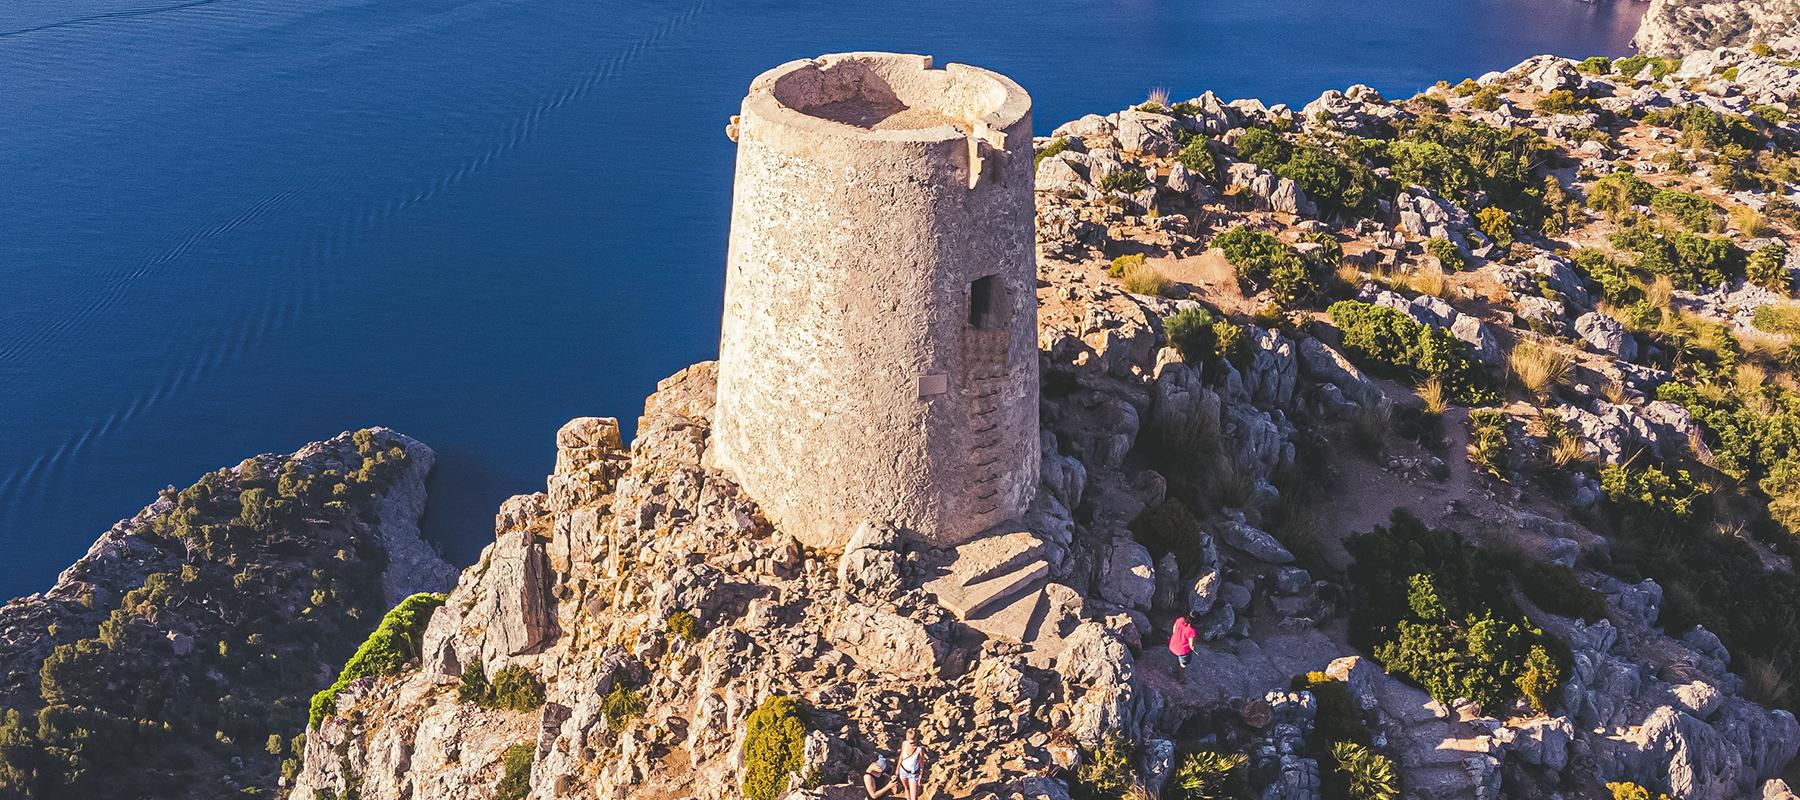 November 28: Habakkuk and the WatchTower